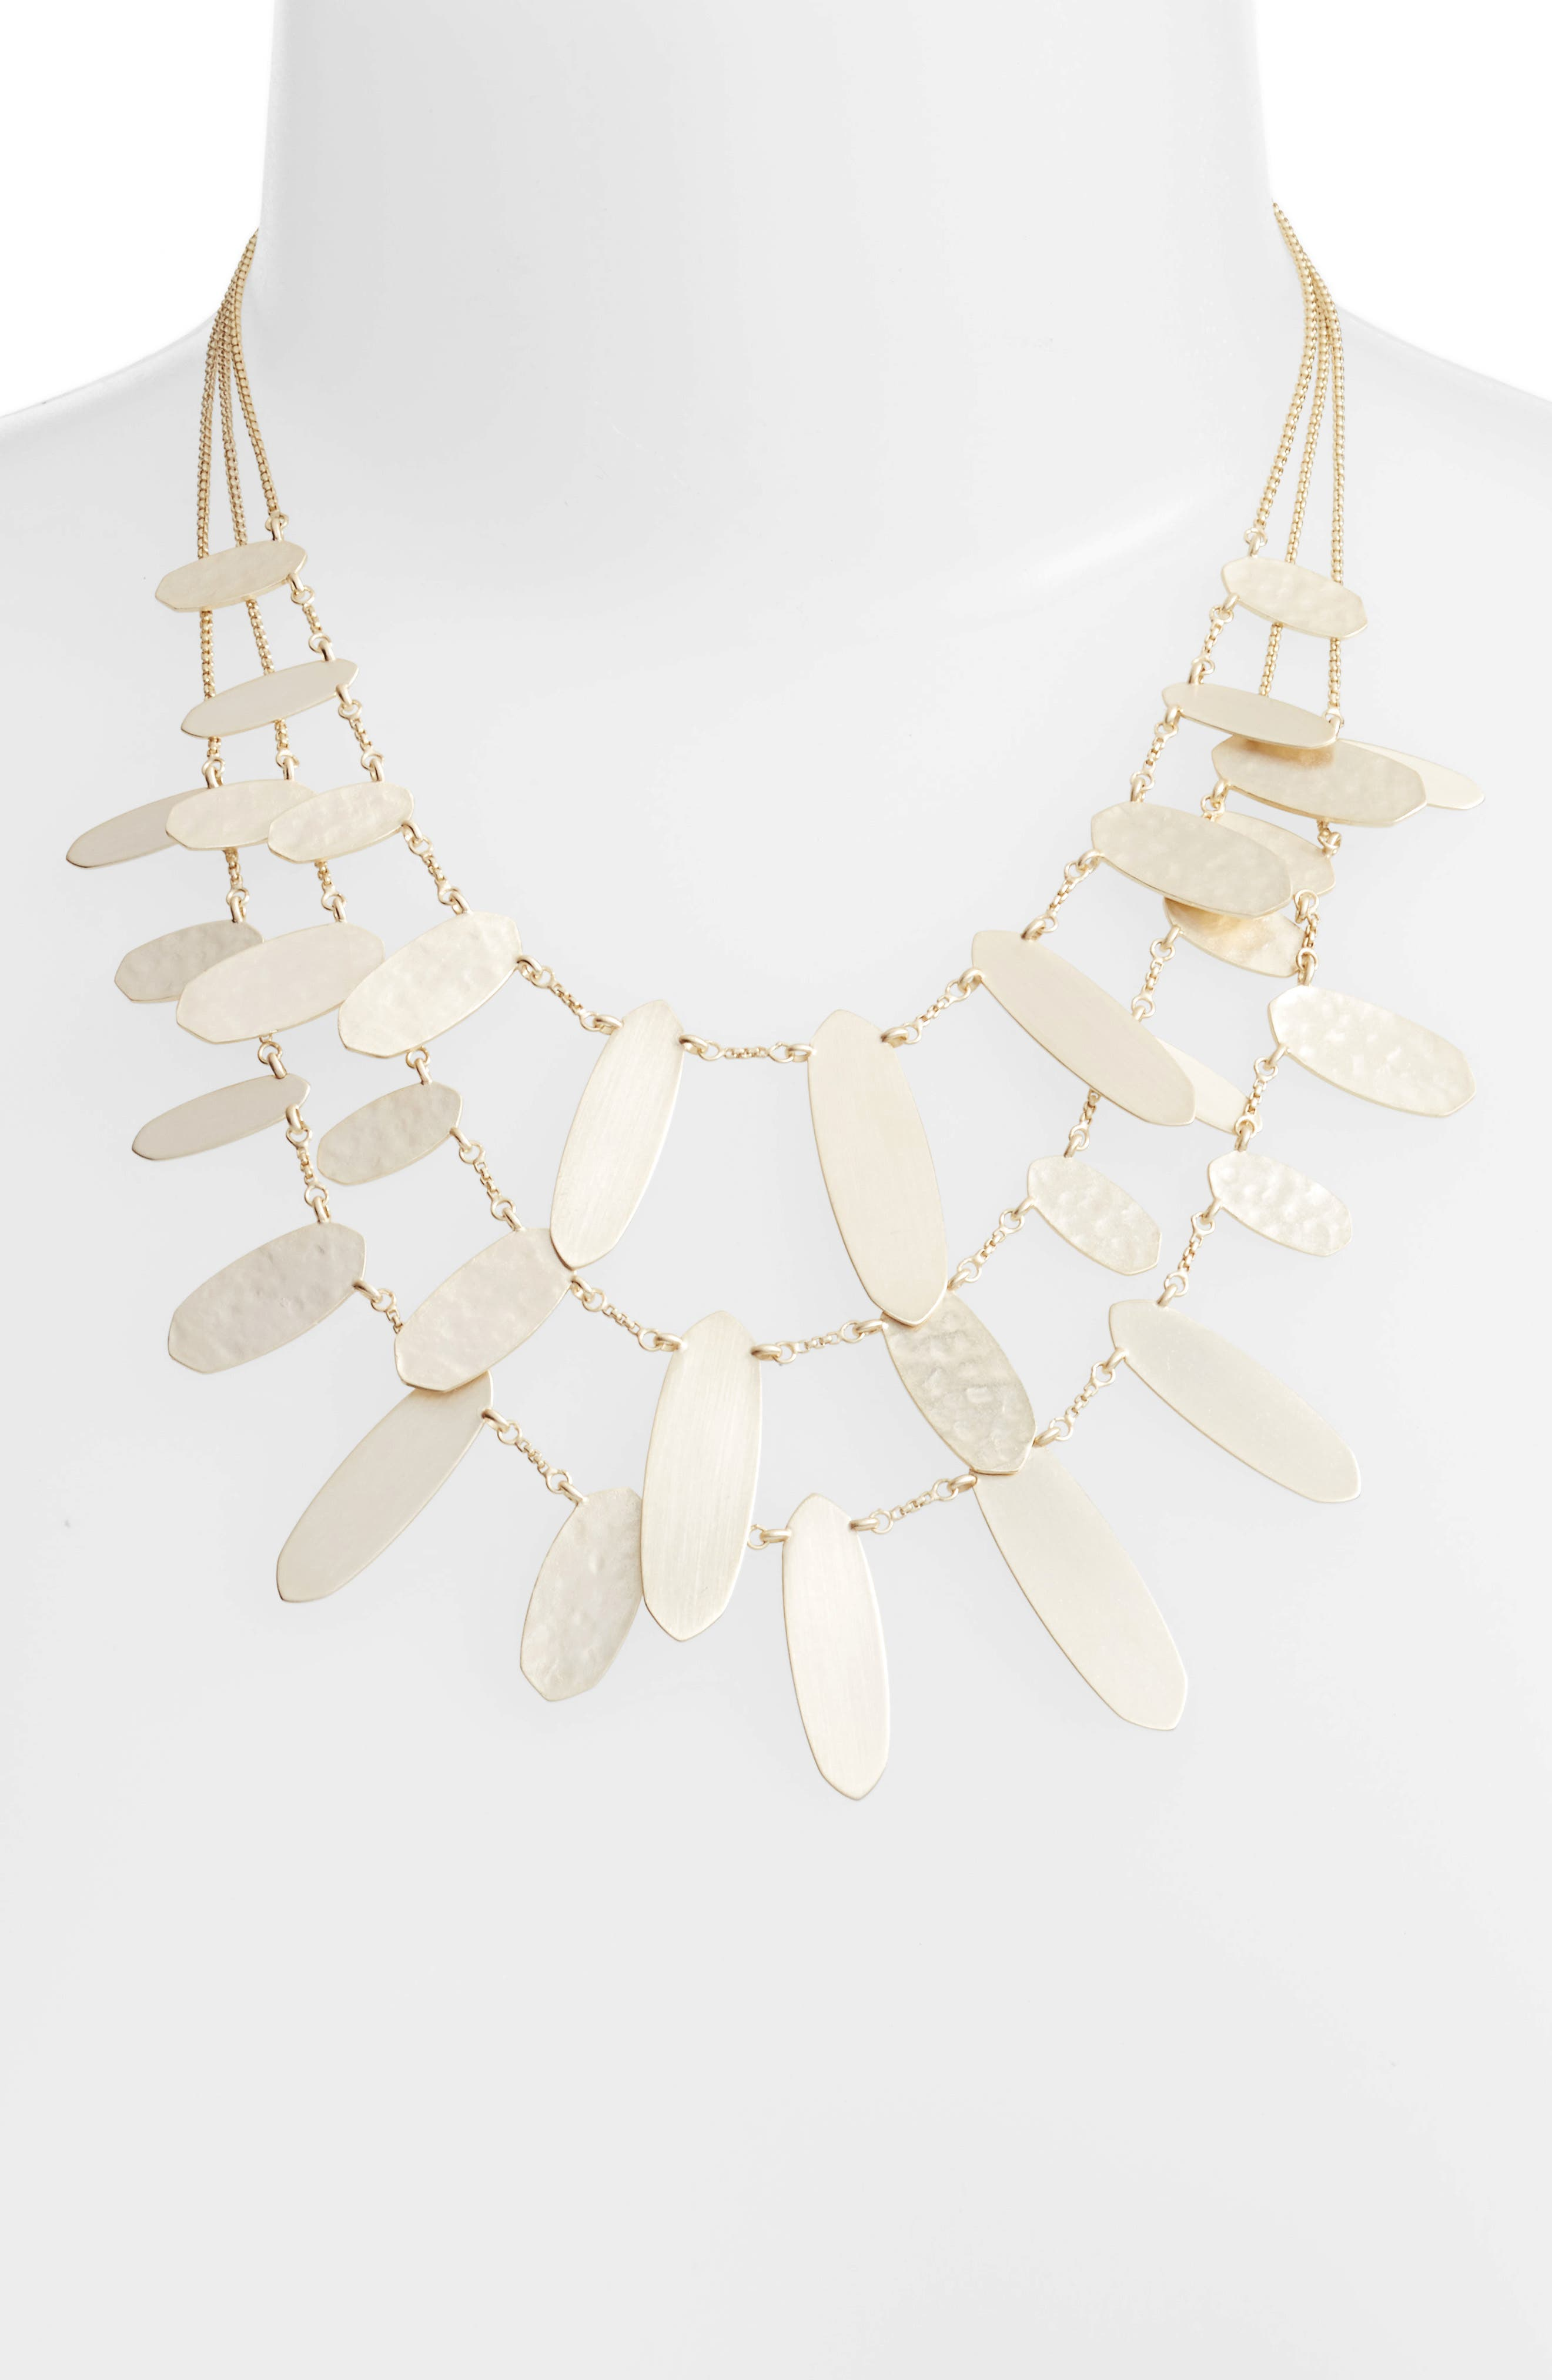 Kendra Scott Nettie Layered Chain Necklace d2tHKD50m